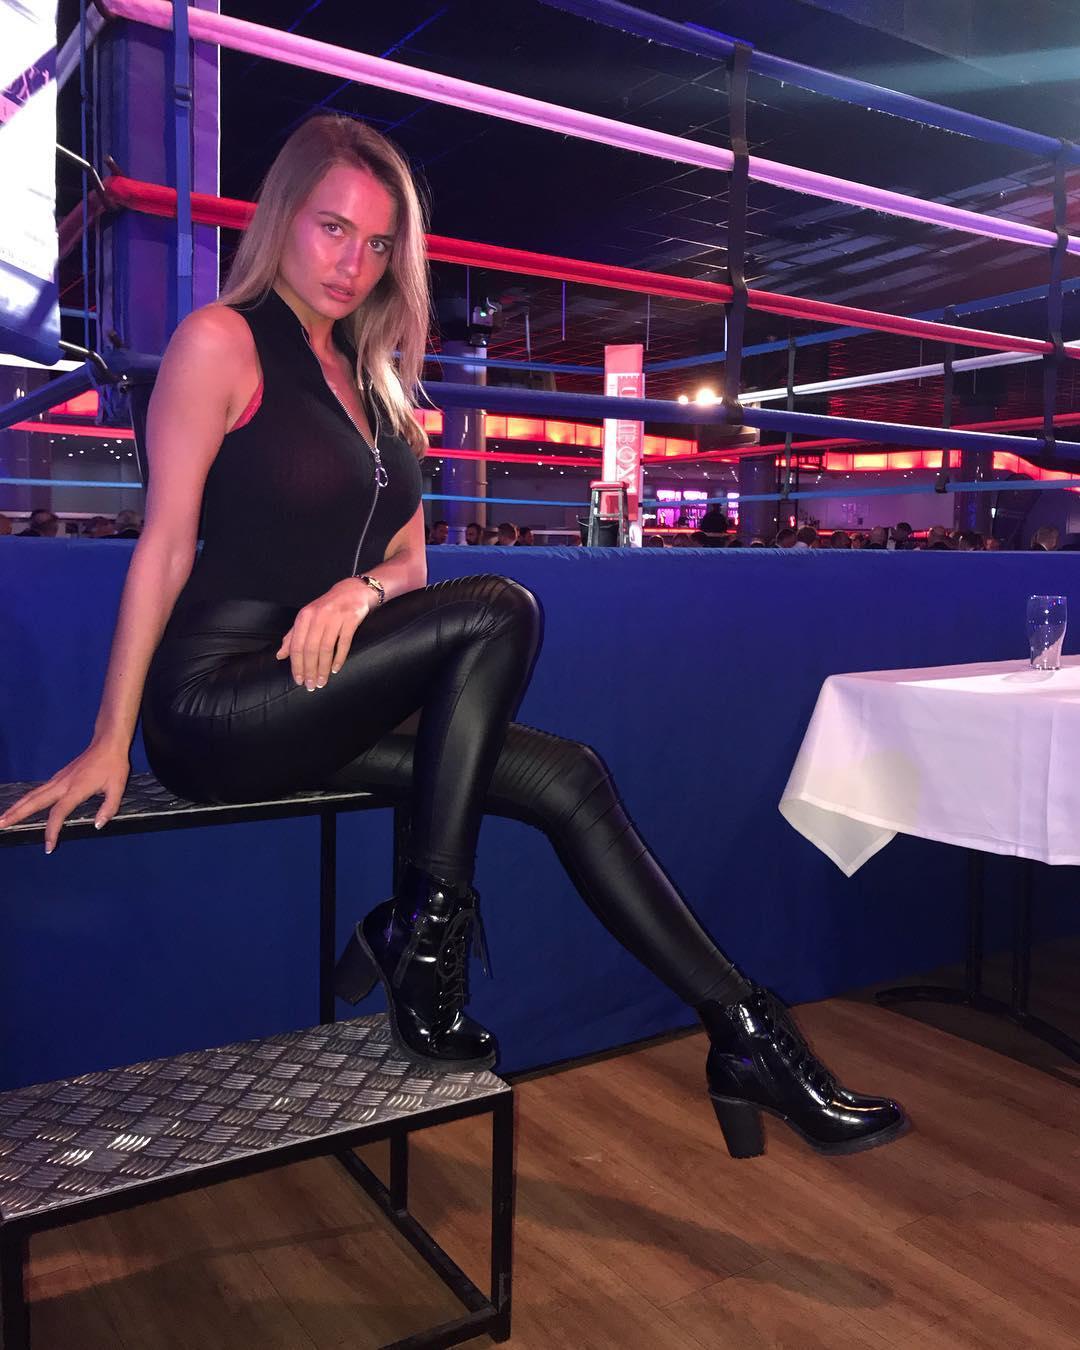 Ring Girls – Private Boxing Event – Butlins, Bognor Regis – 29th November 2018